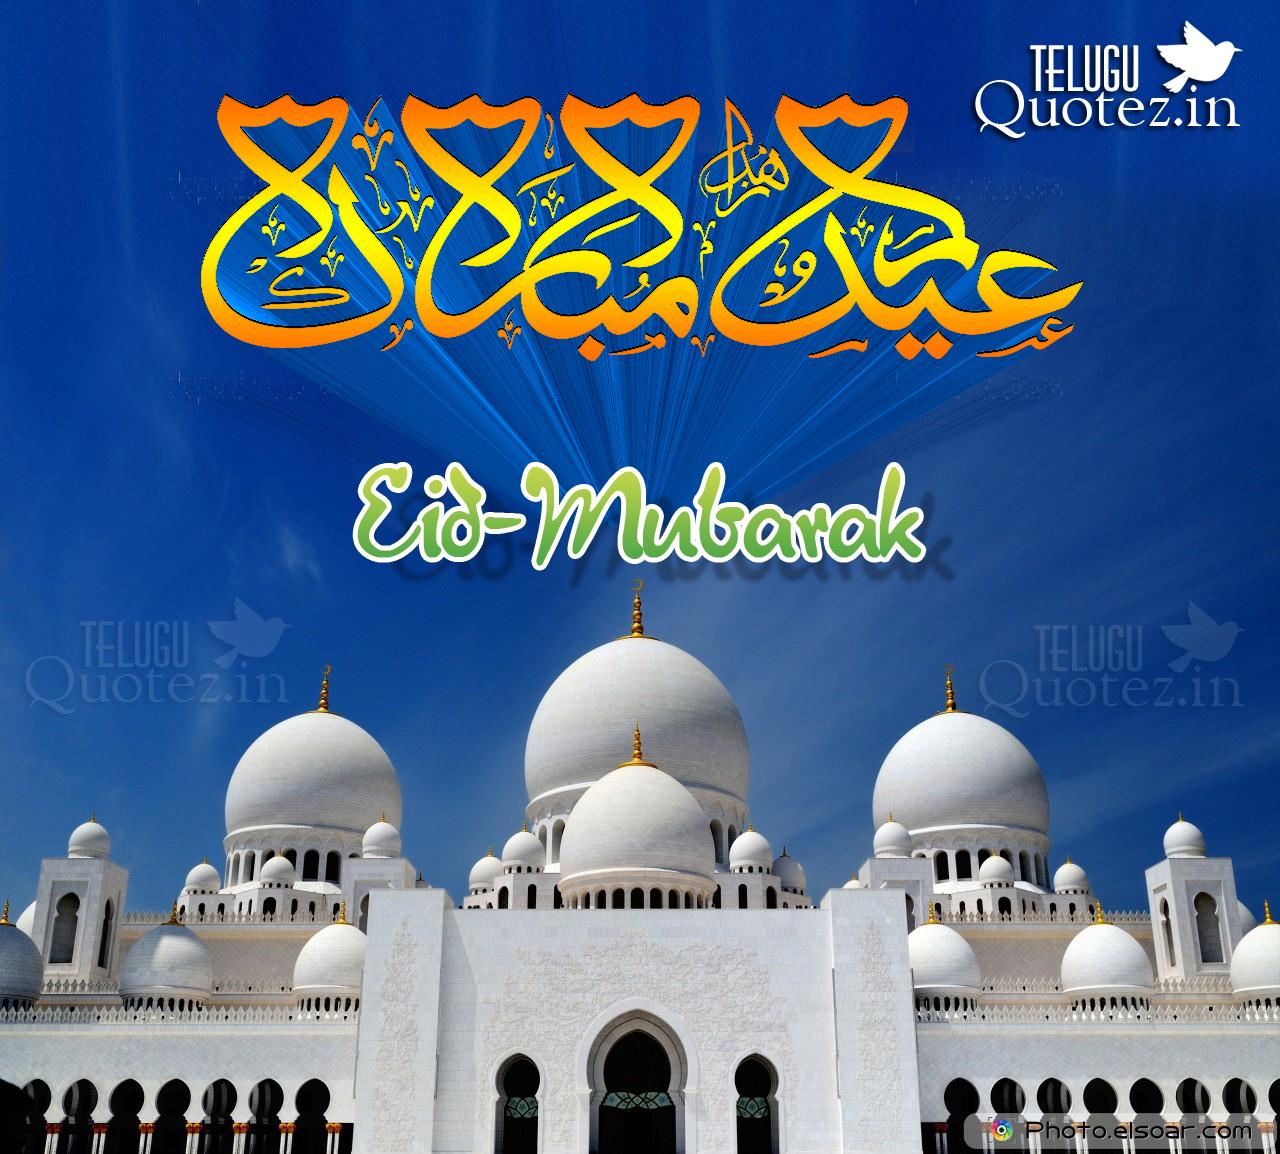 essay on ramadan eid The lesser one, eid al-fitr, falls at the end of the holy month of ramadan afghan men attend eid al-adha prayers outside of shah-e-dushamshera mosque in kabul, afghanistan, on aug 21, 2018.